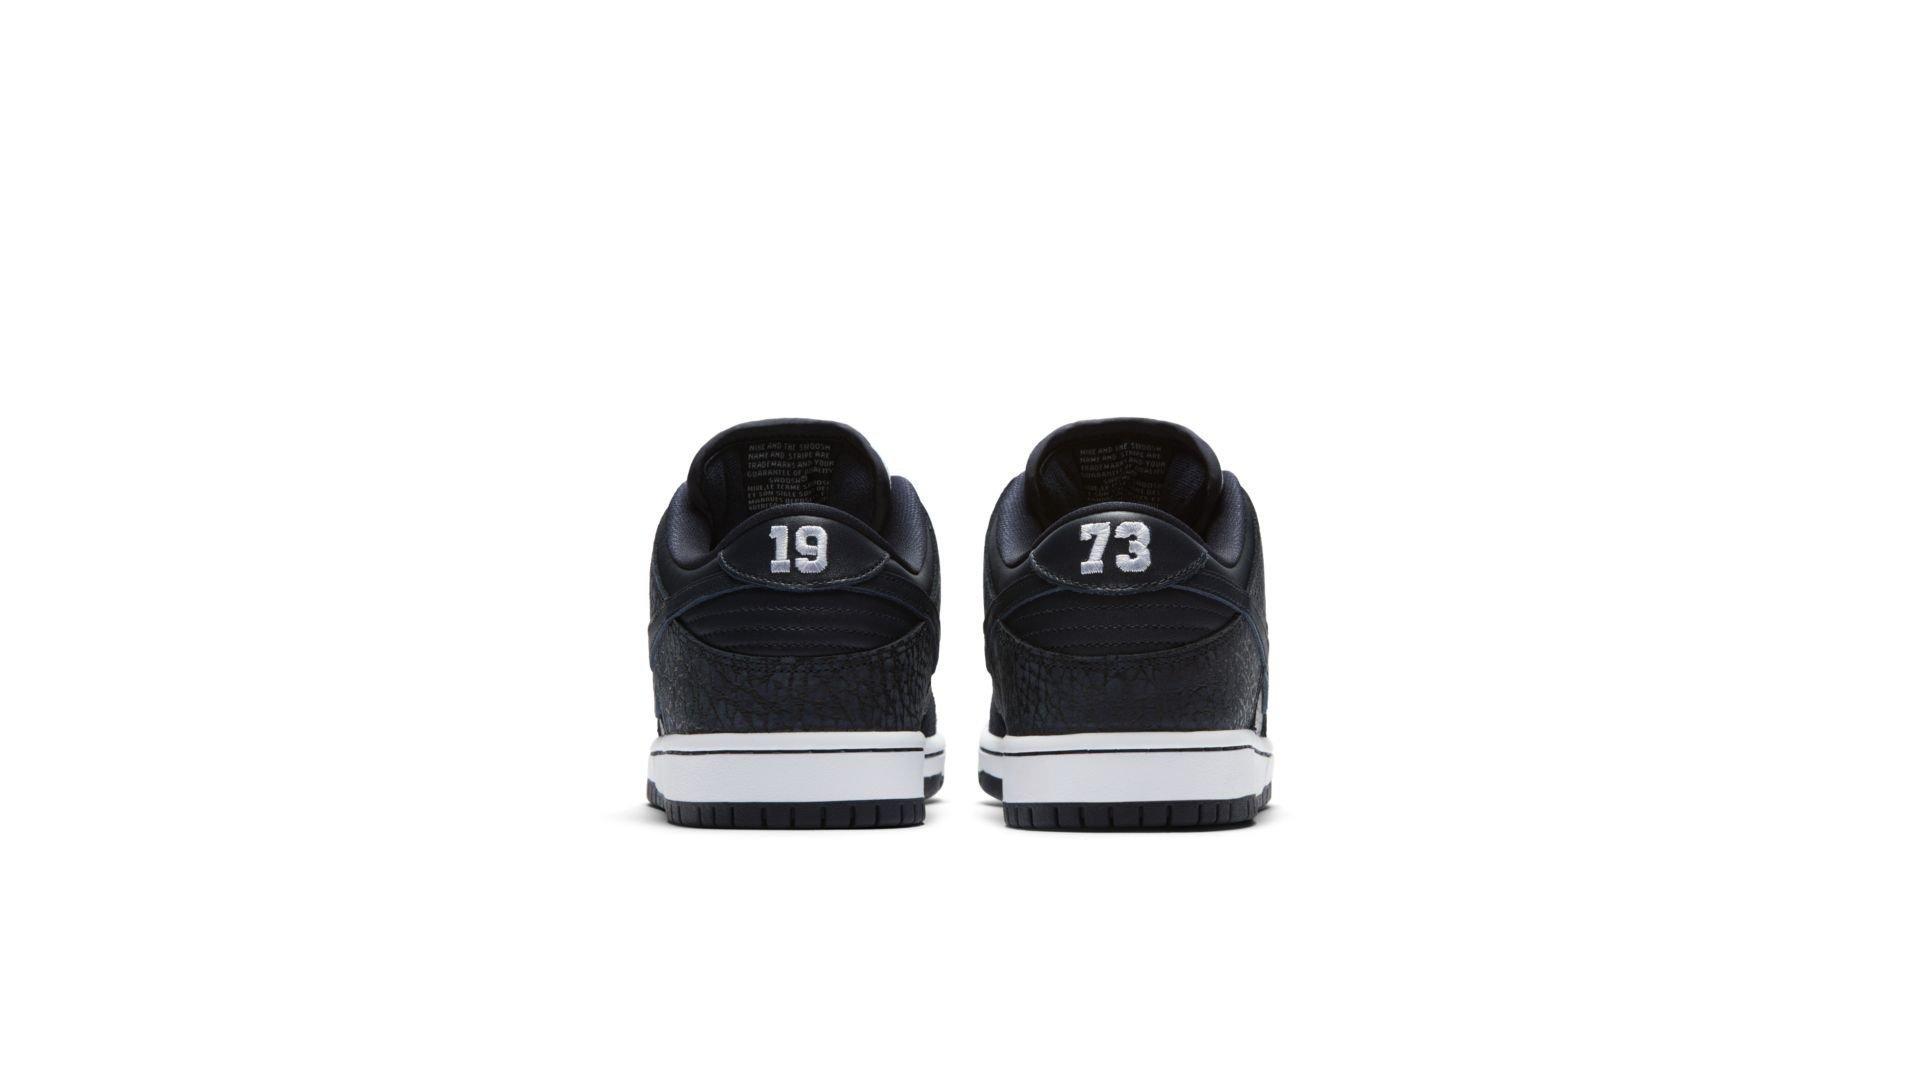 Nike SB Dunk Low 'Ride Life' (883232-442)